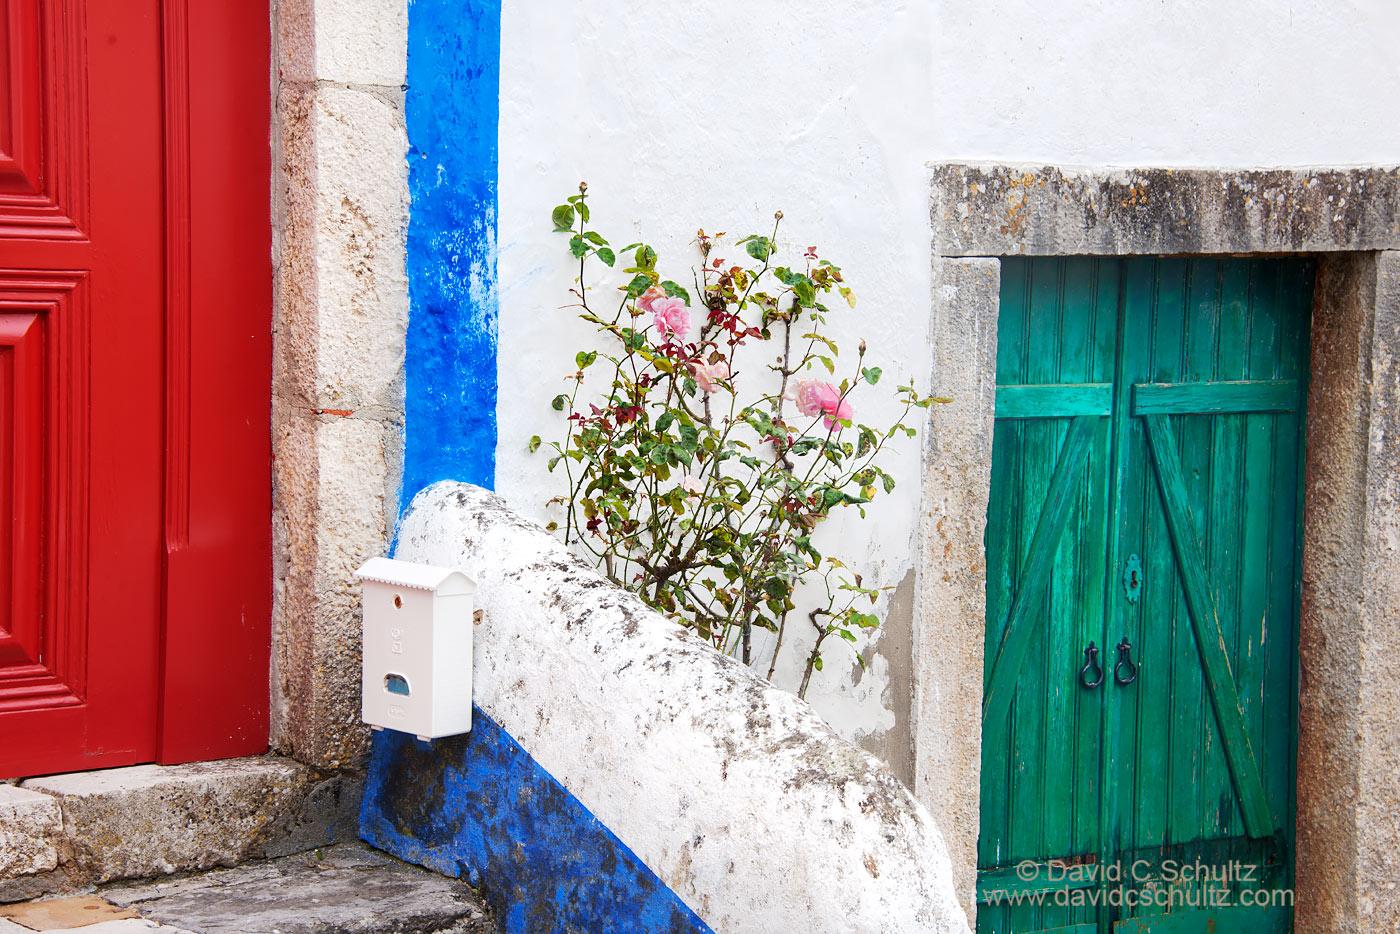 Obidos, Portugal - Image #203-348